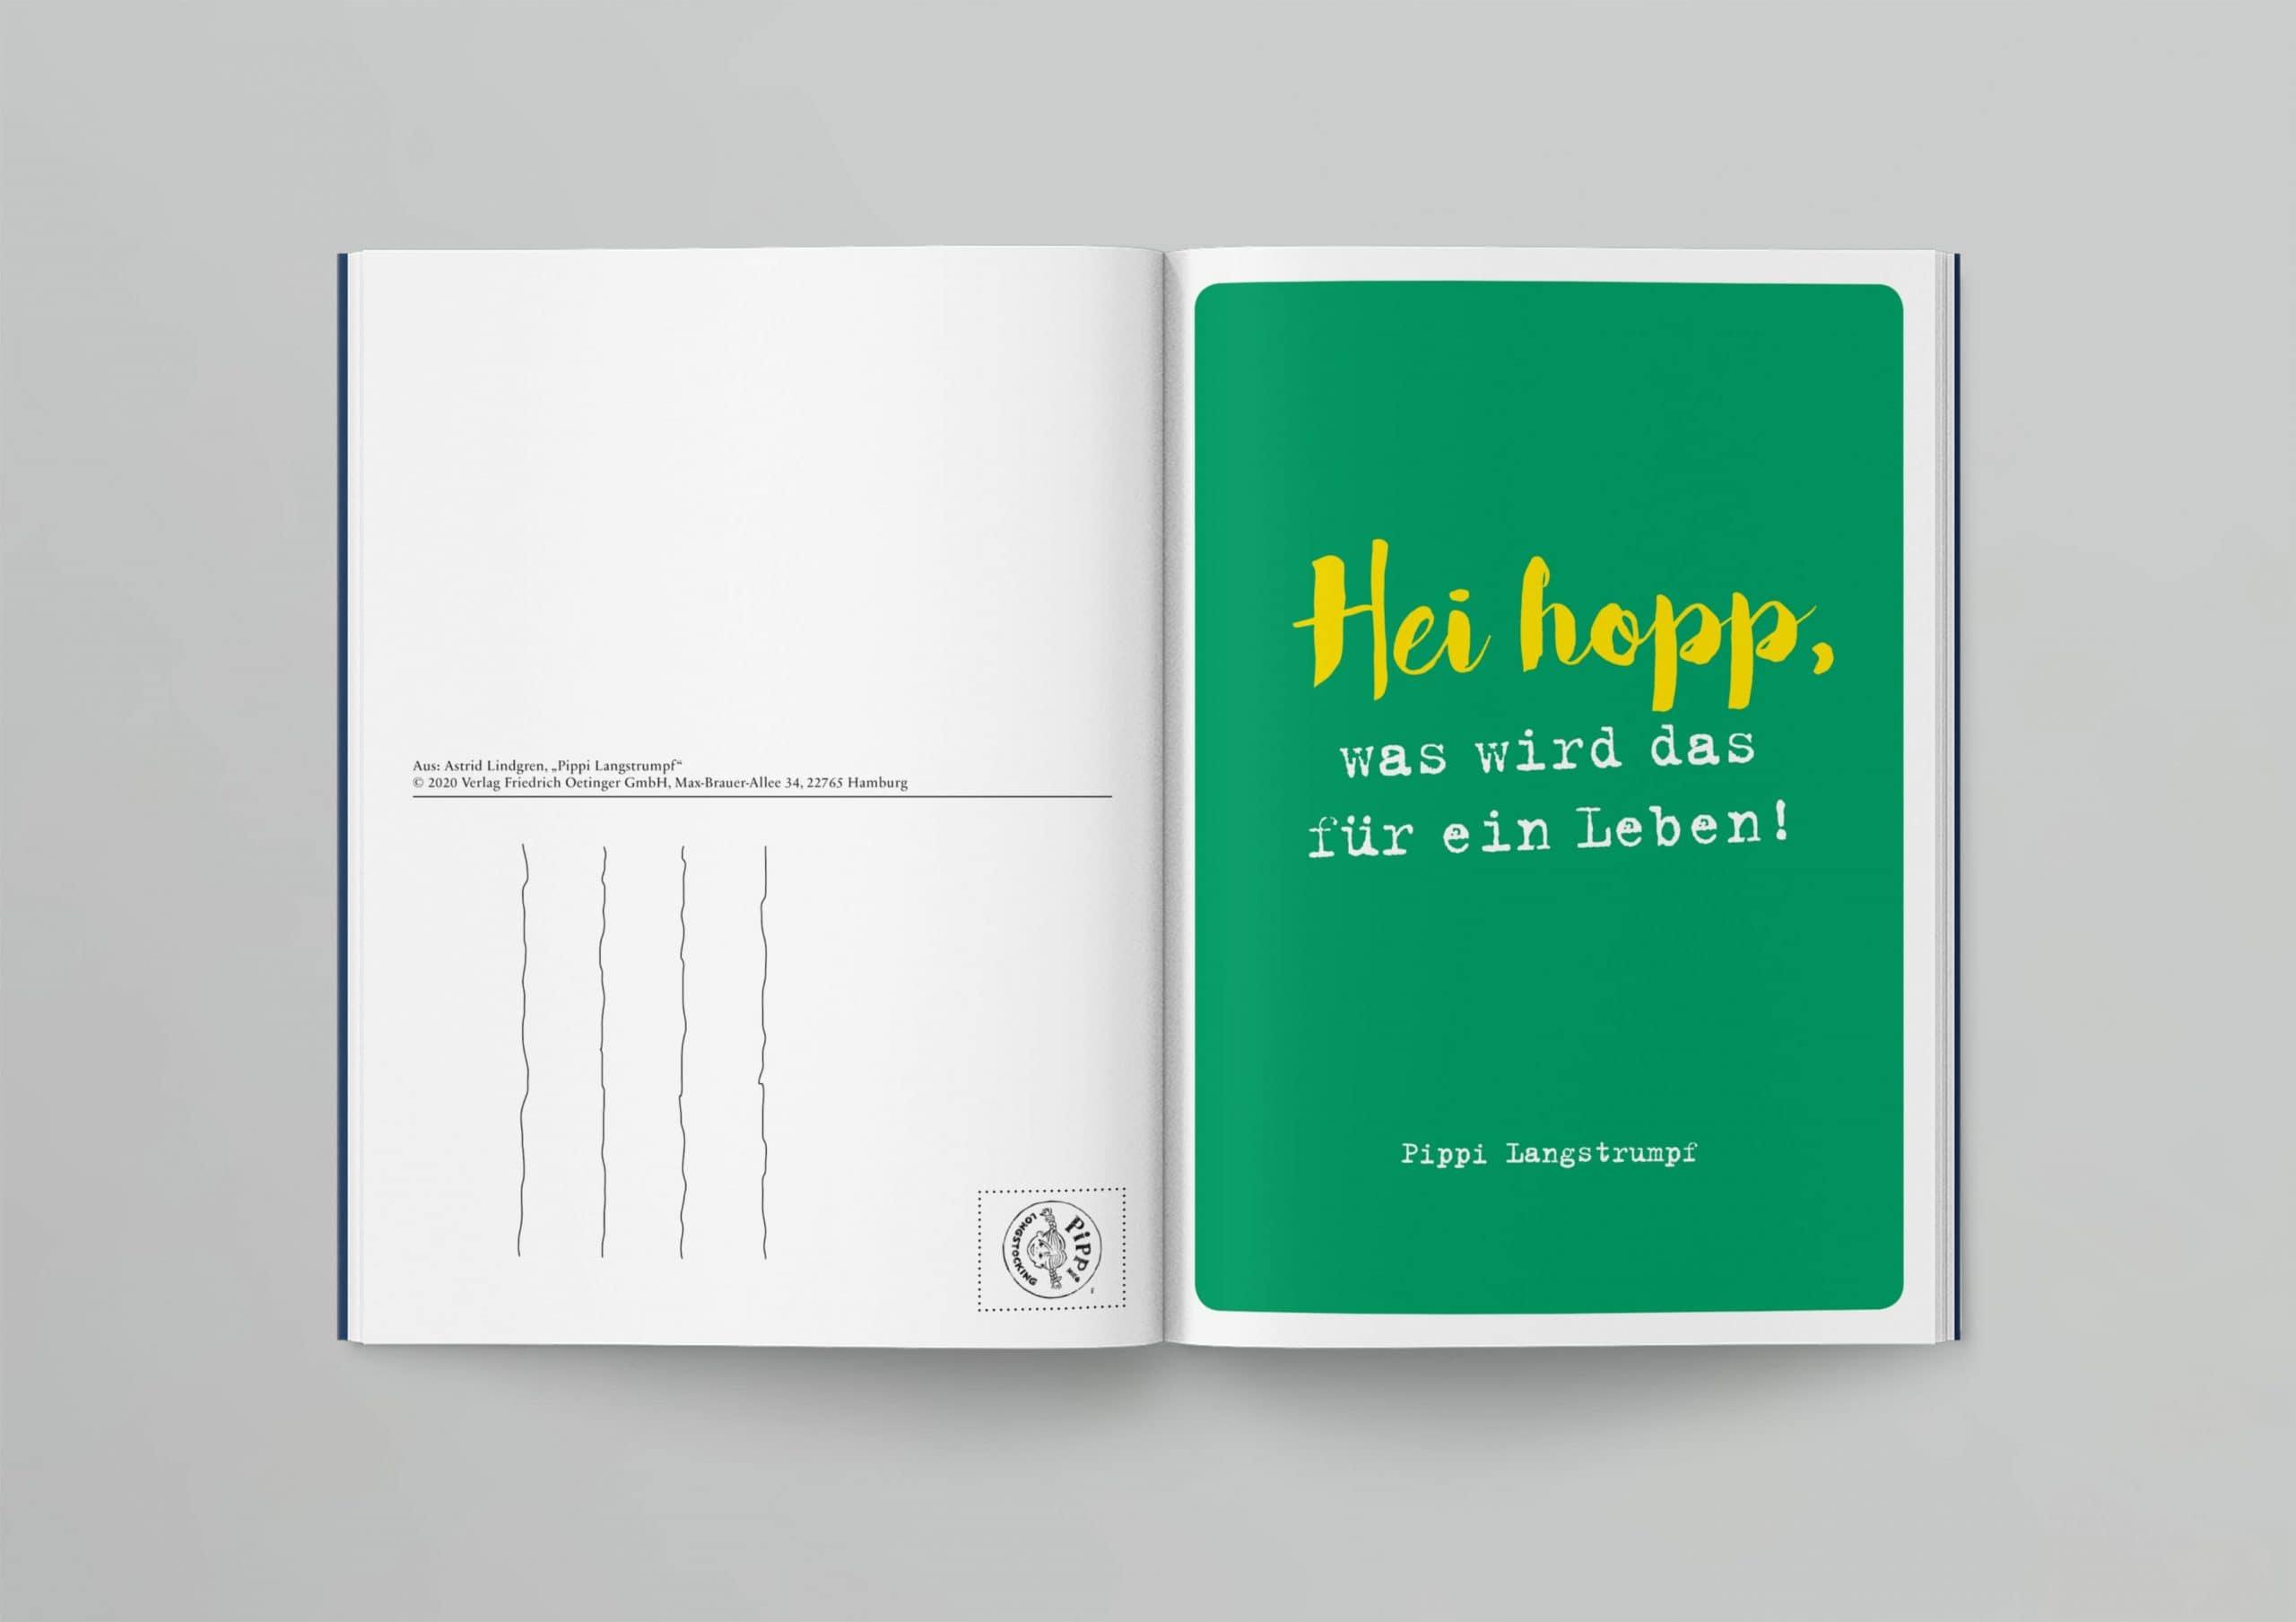 Oetinger-Pippi-Langstrumpf-Postkarten-IN02